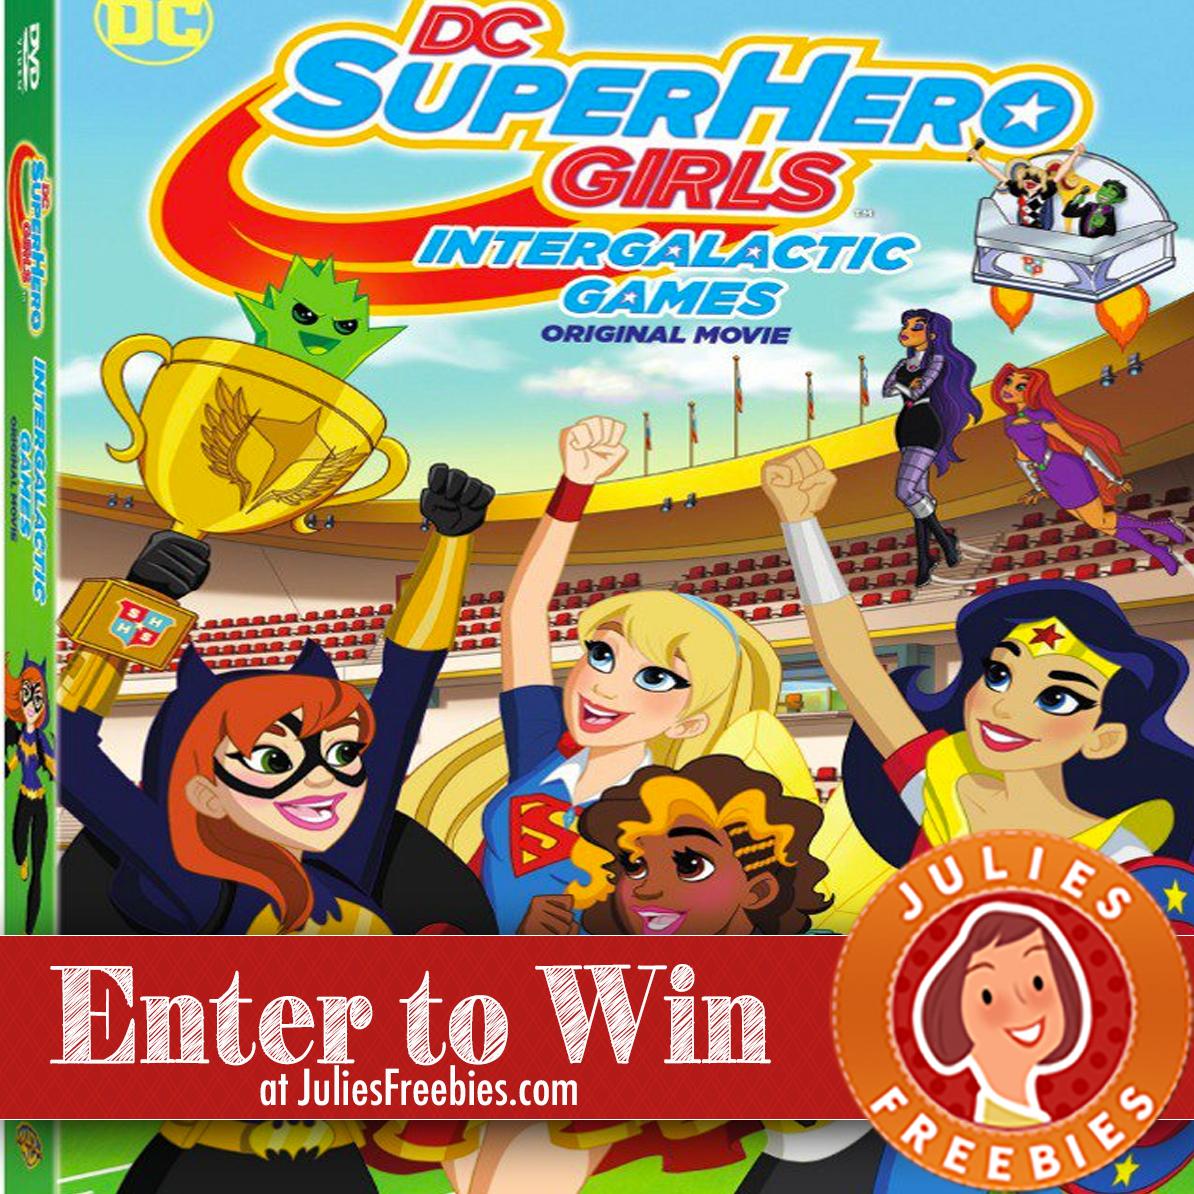 dc superhero high intergalactic games full movie